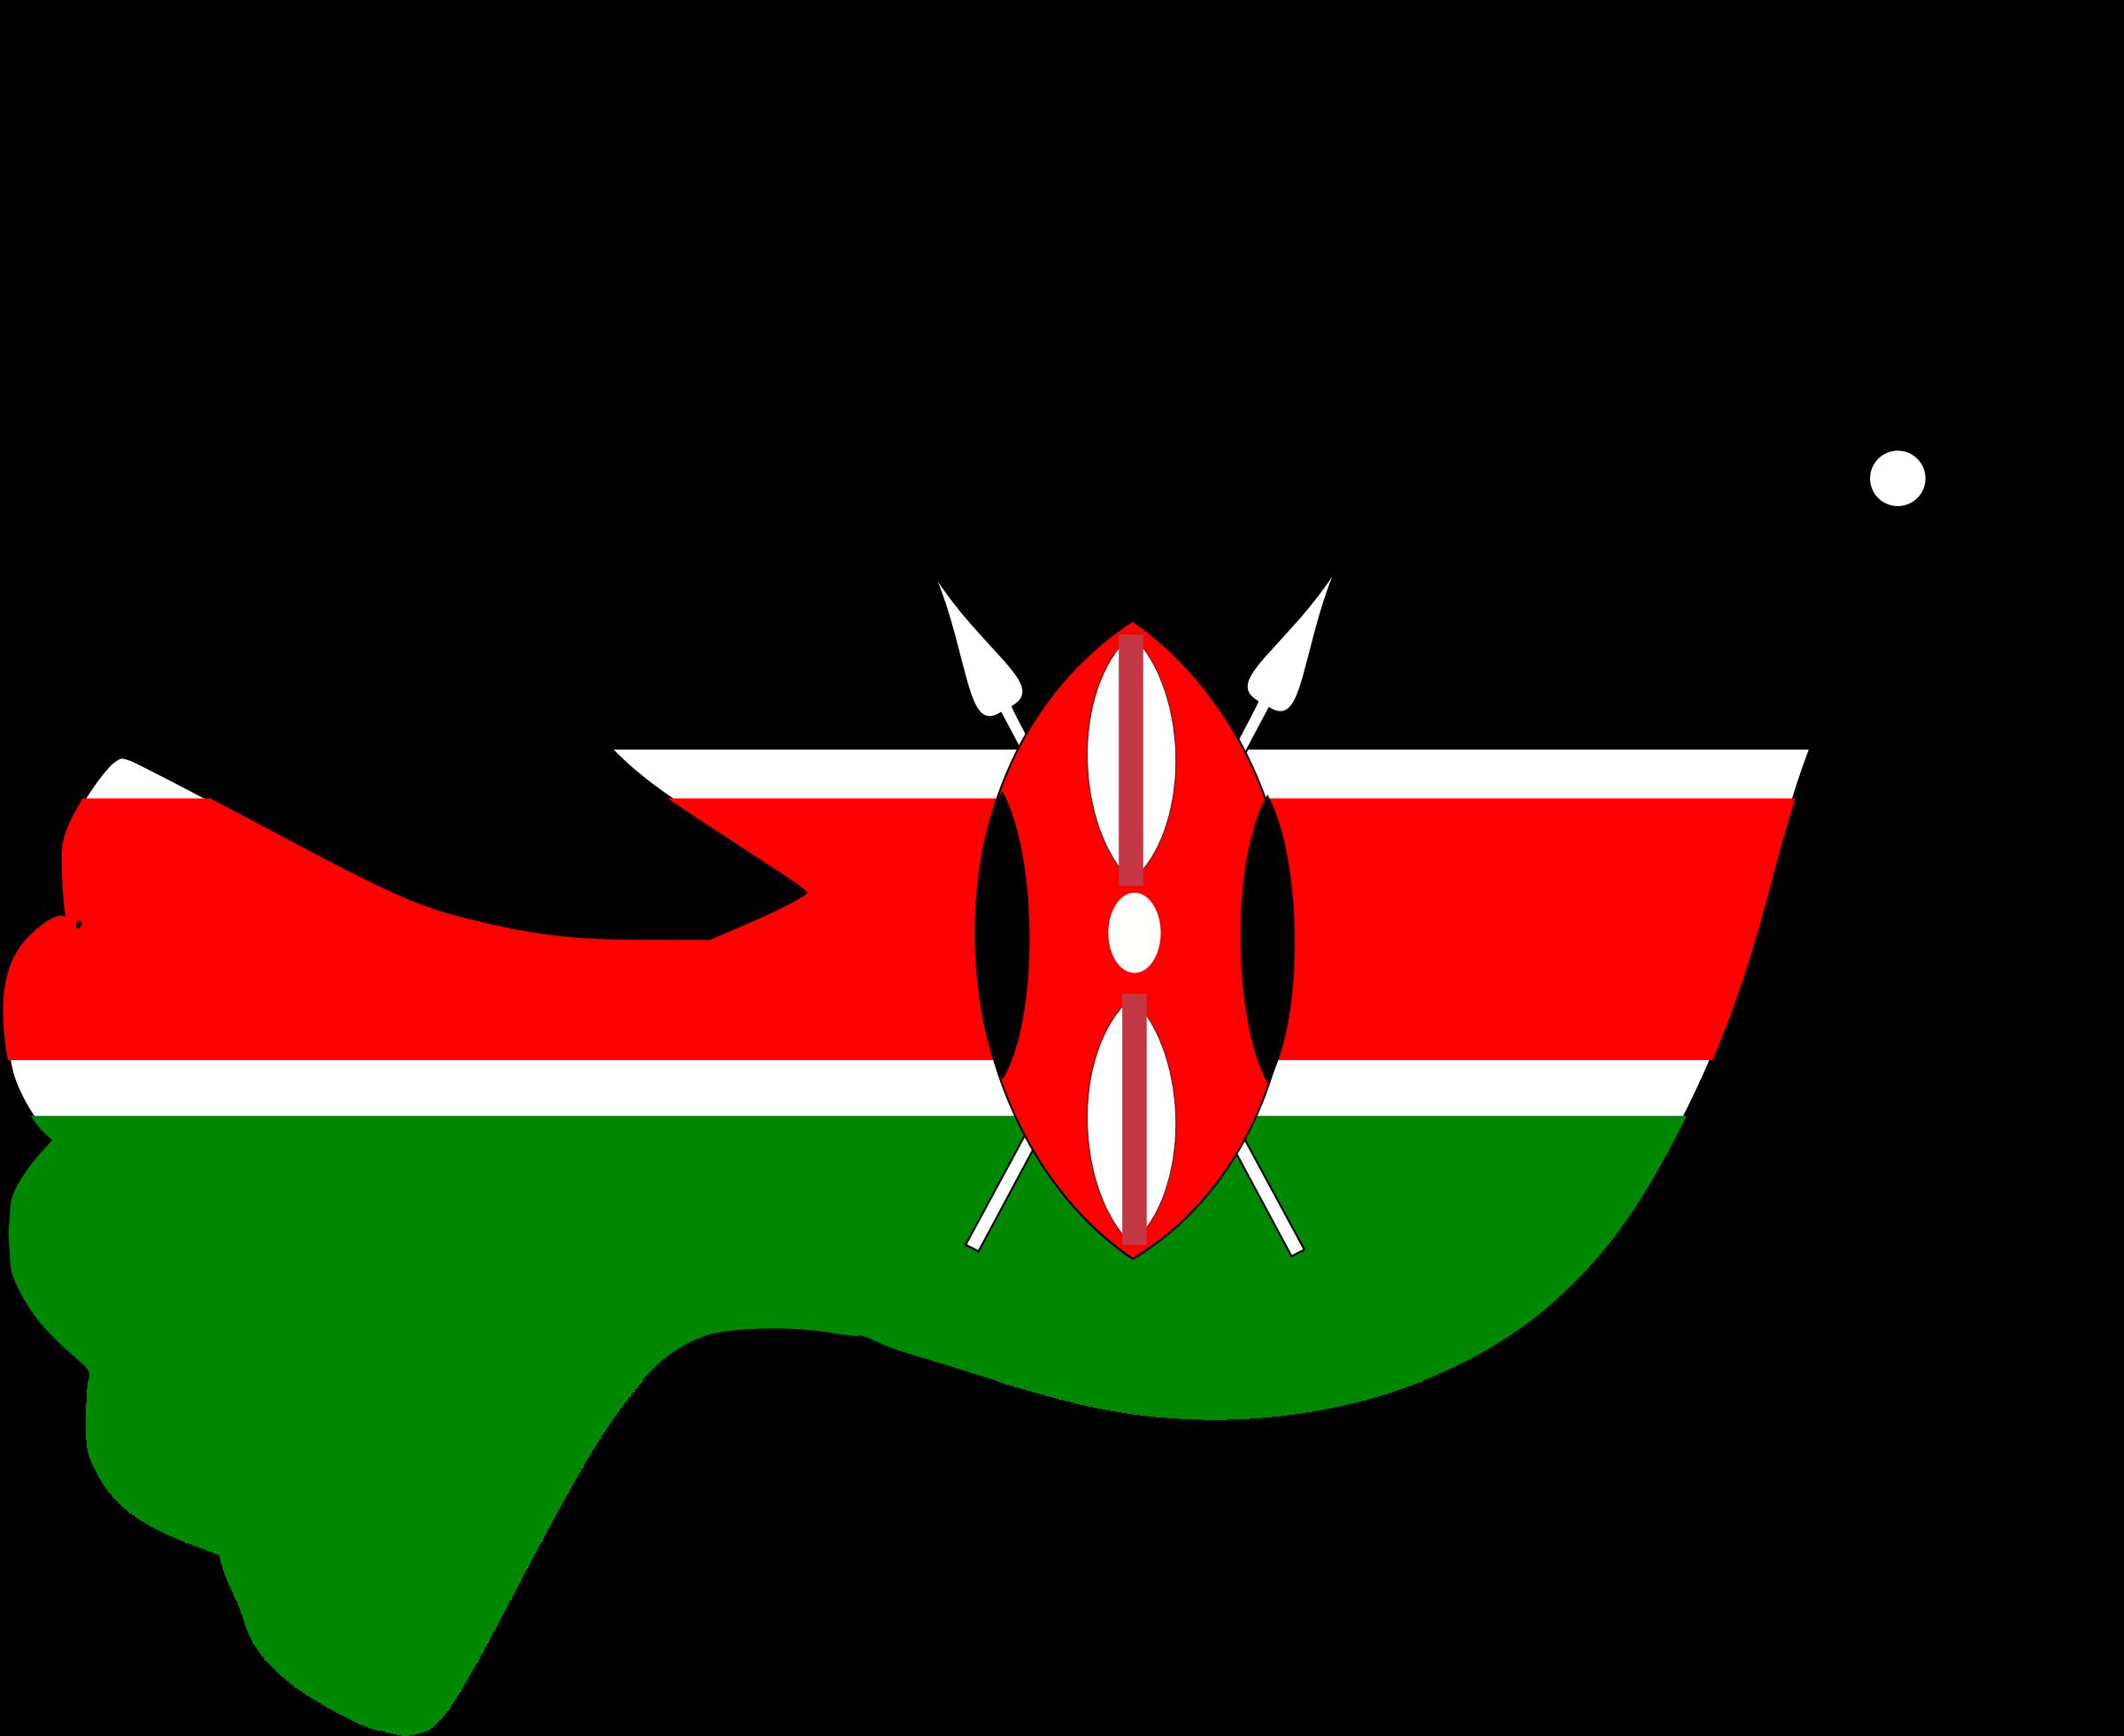 Kenya clipart Kenya peace Clipart Kenya dove